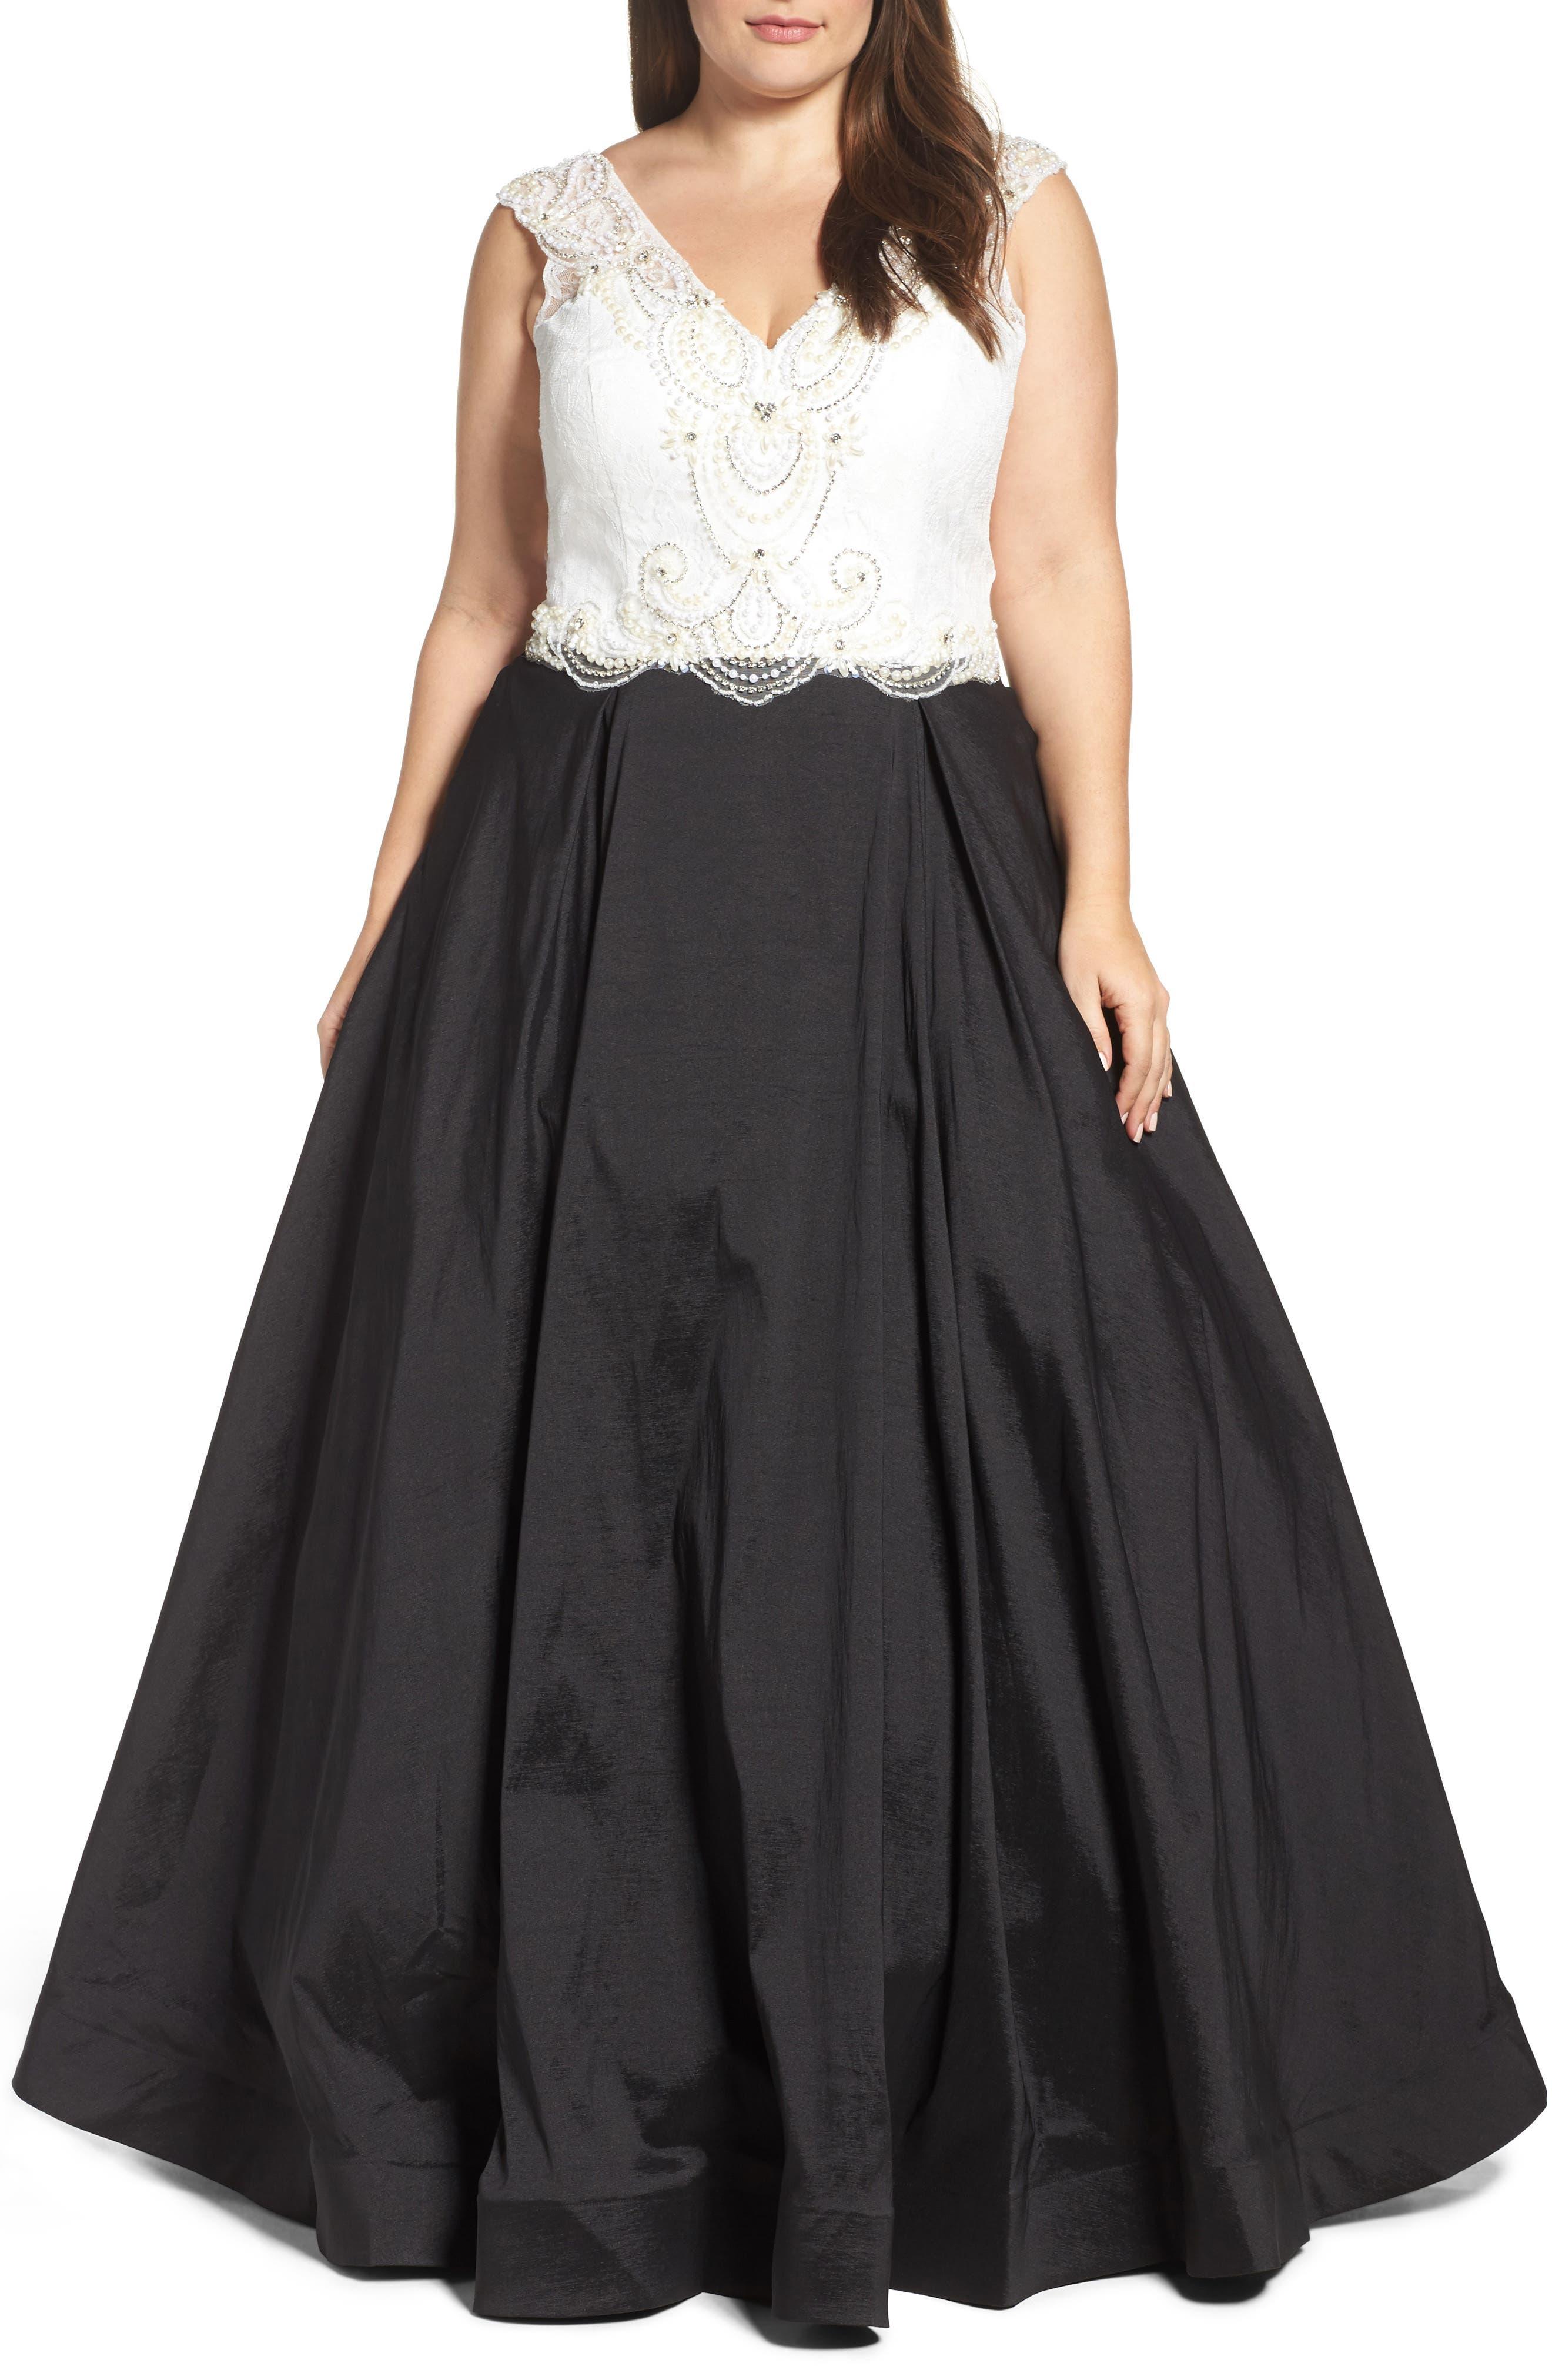 Main Image - Mac Duggal Embellished Lace & Taffeta Ballgown (Plus Size)